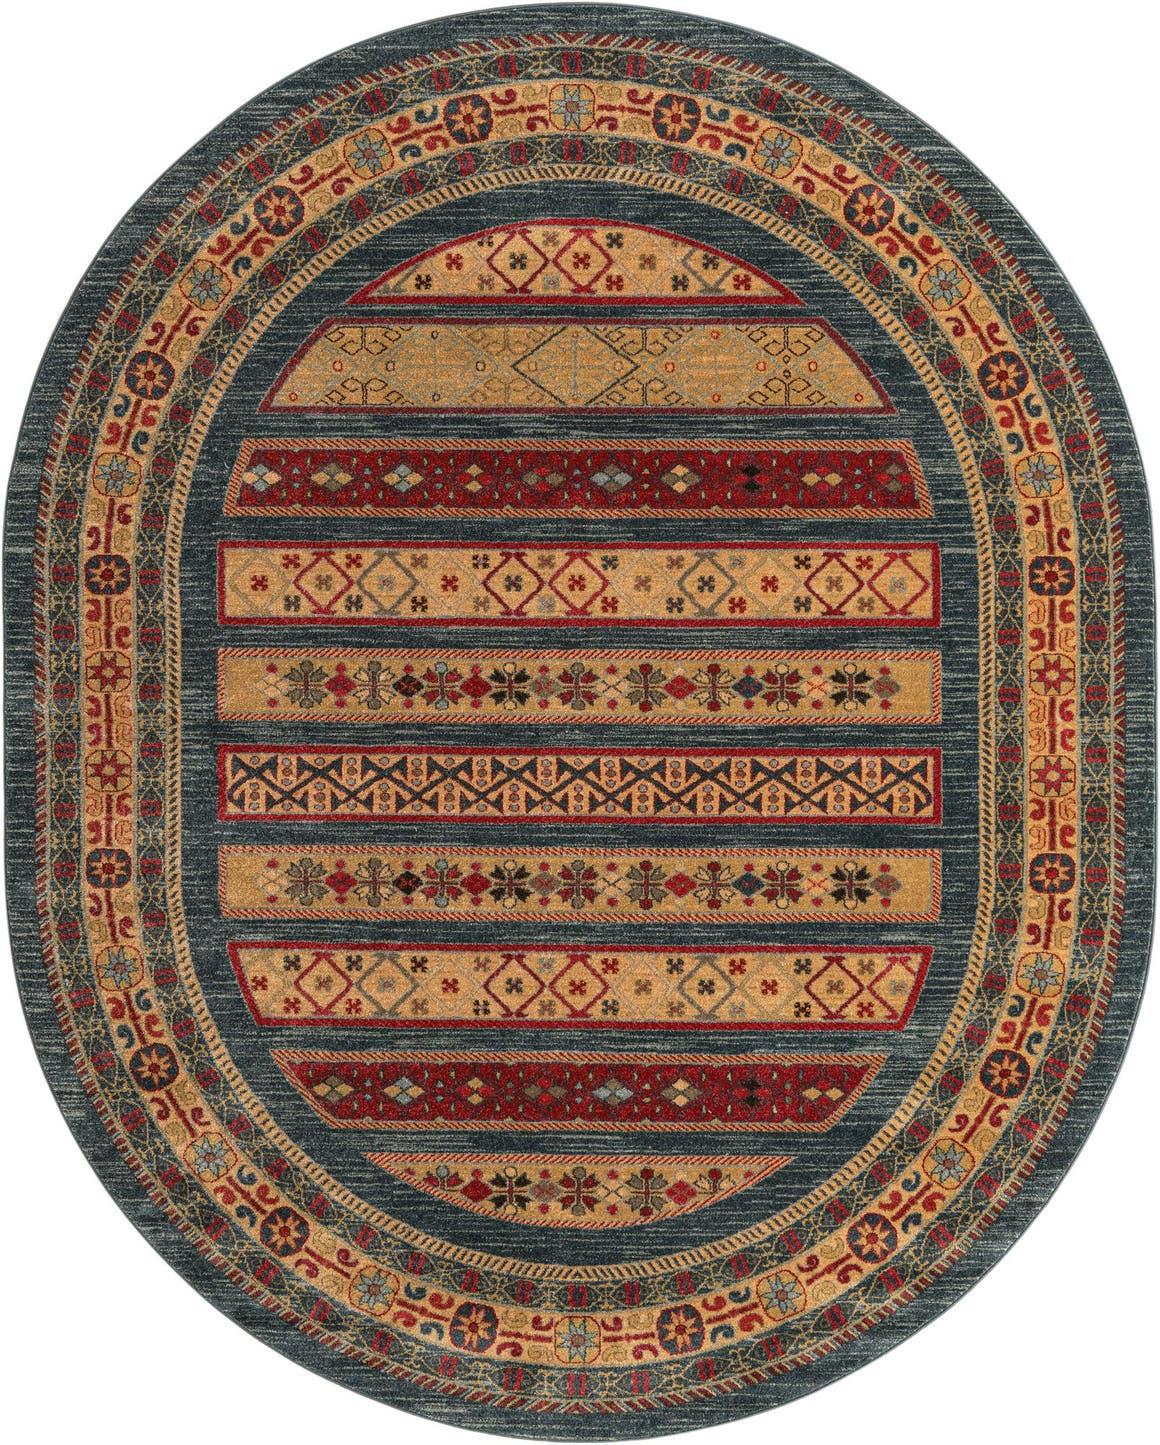 8' x 10' Kashkuli Gabbeh Oval Rug main image